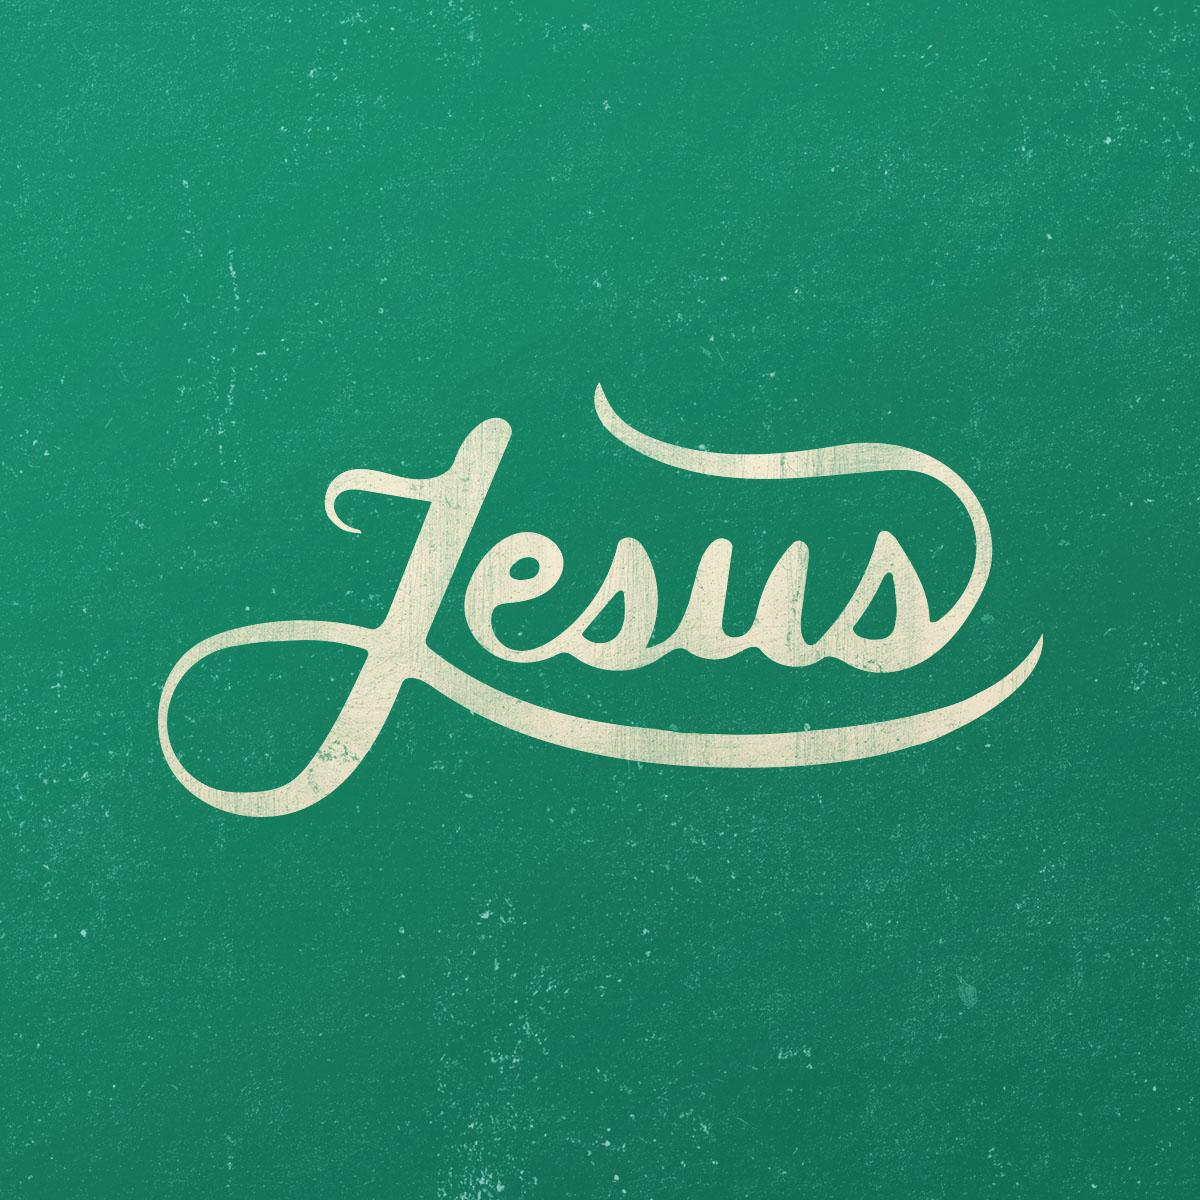 Jesus_1x1_square.jpg